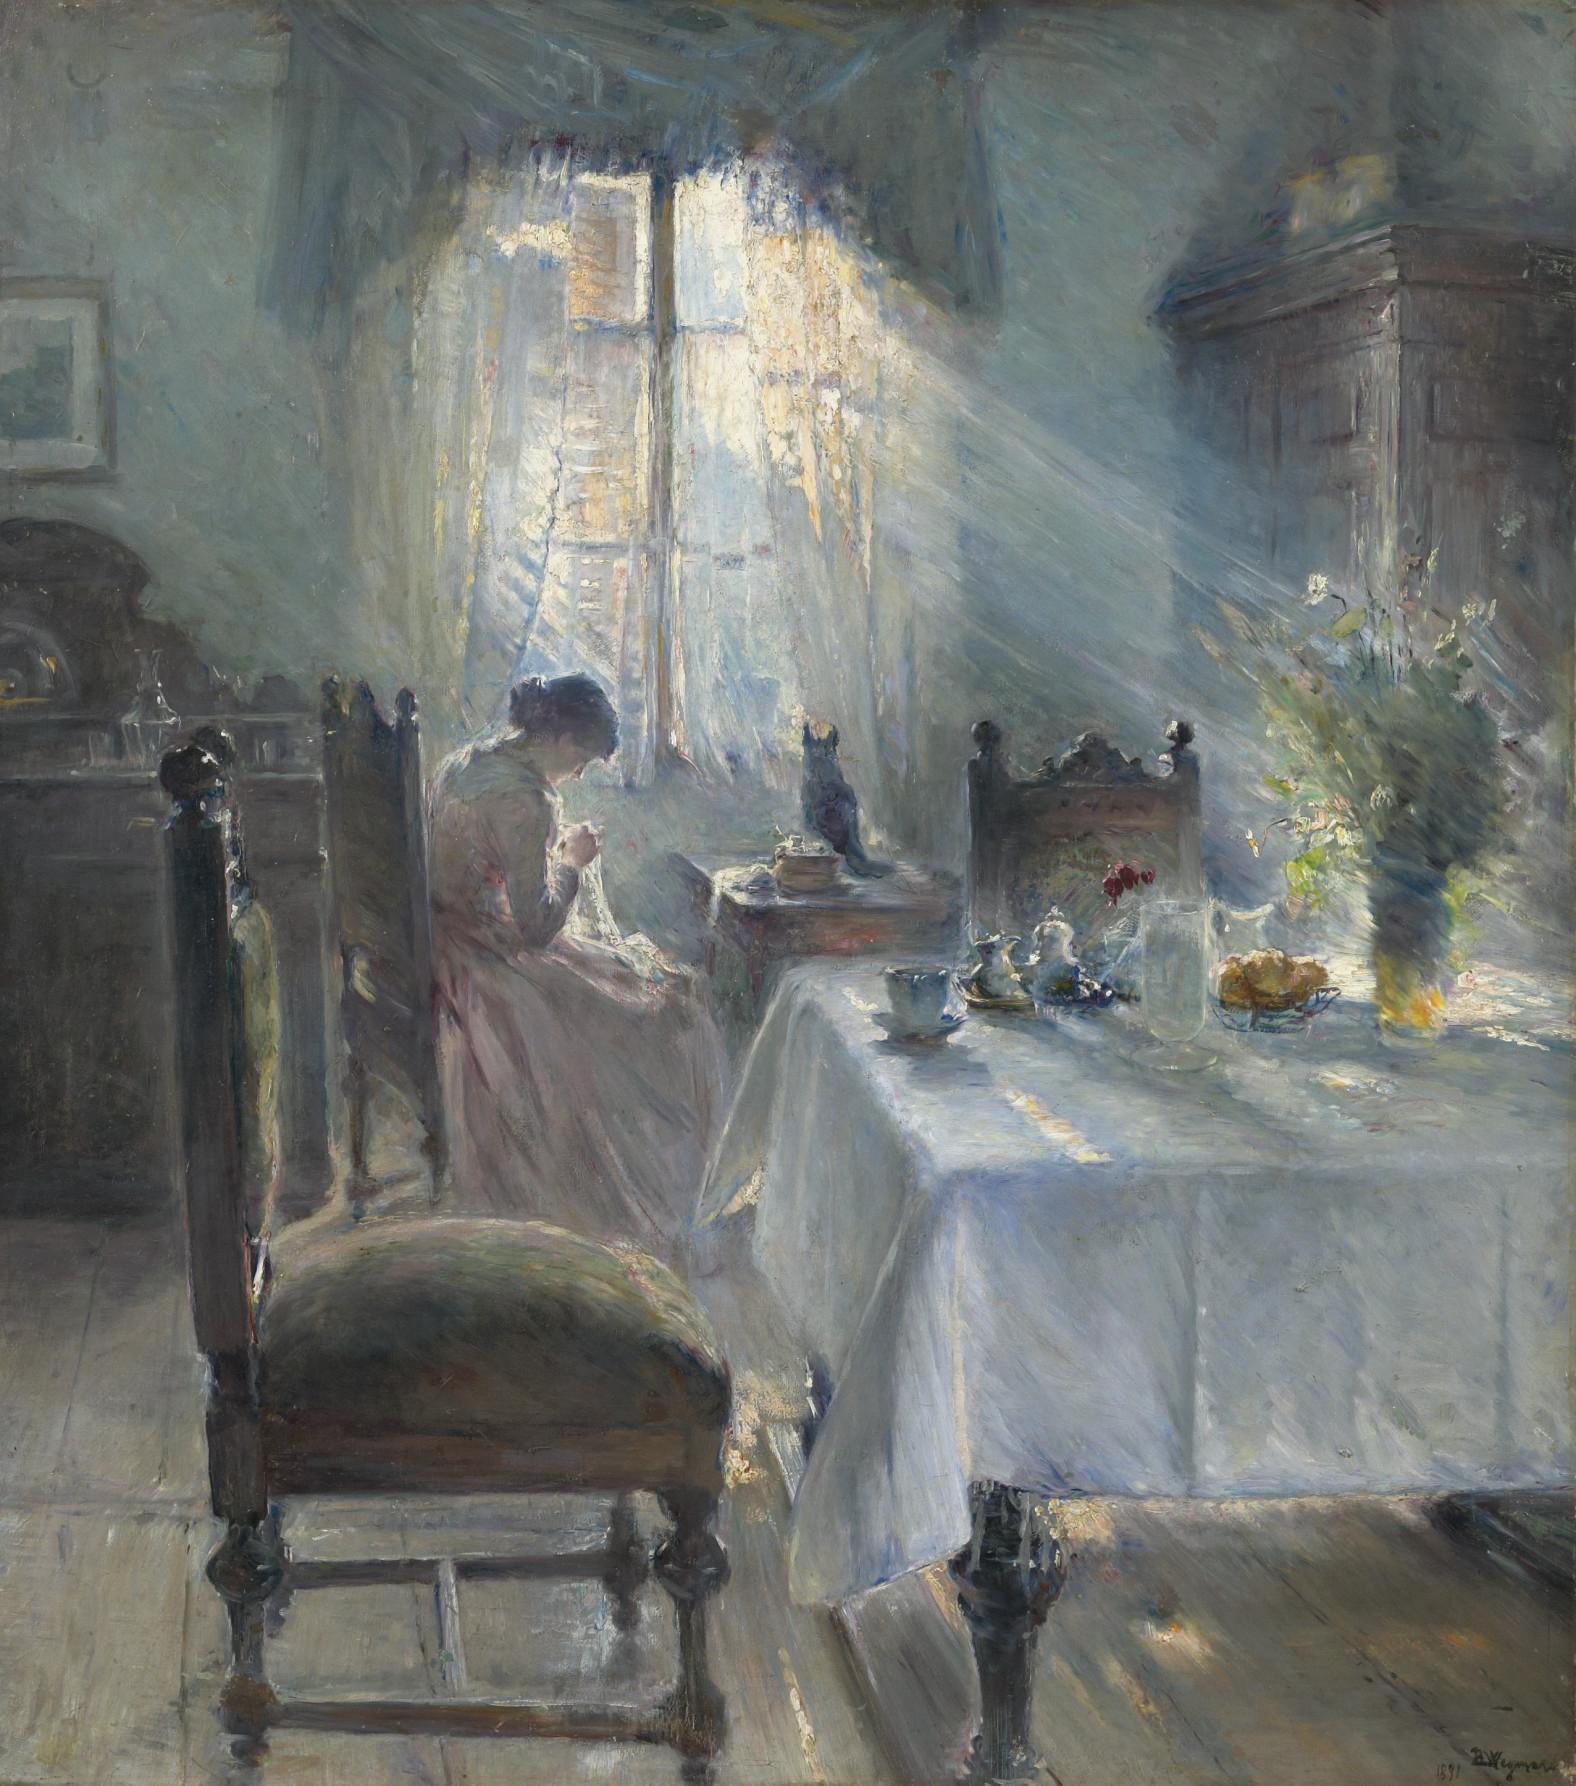 Bertha Wegmann (Danish, 1847-1